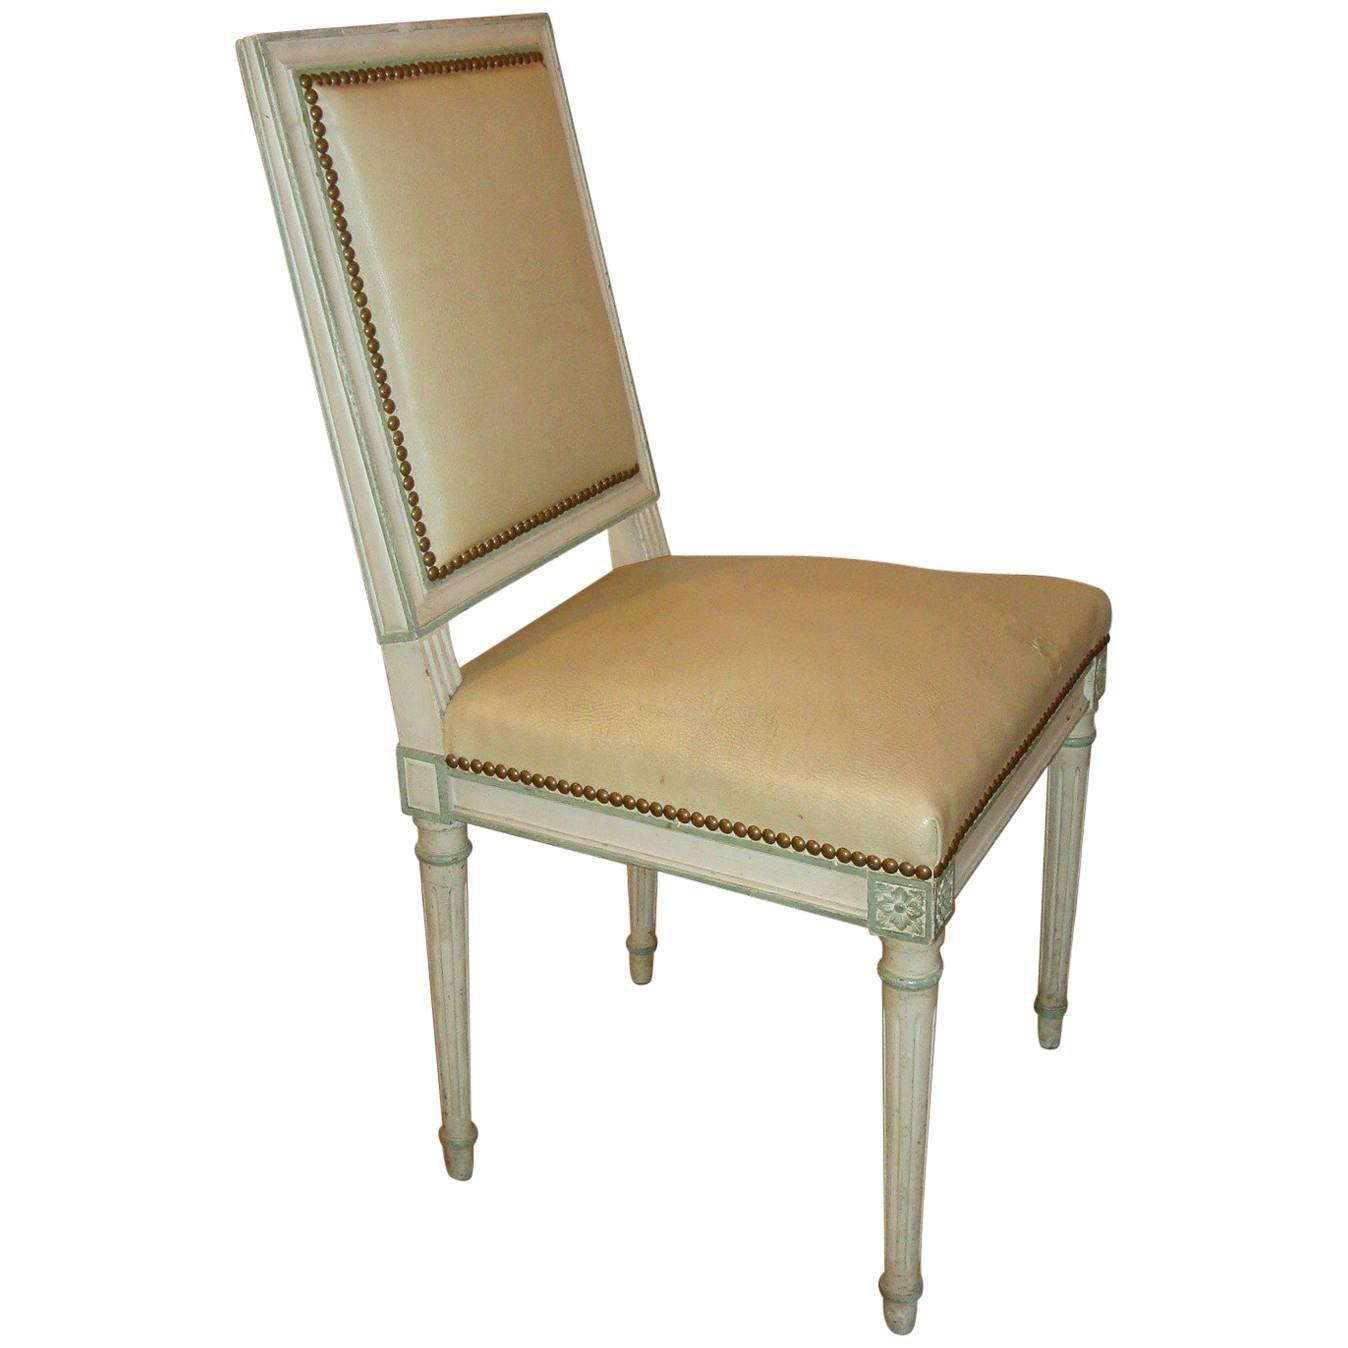 Maison Jansen Paint Decorated Side Chair